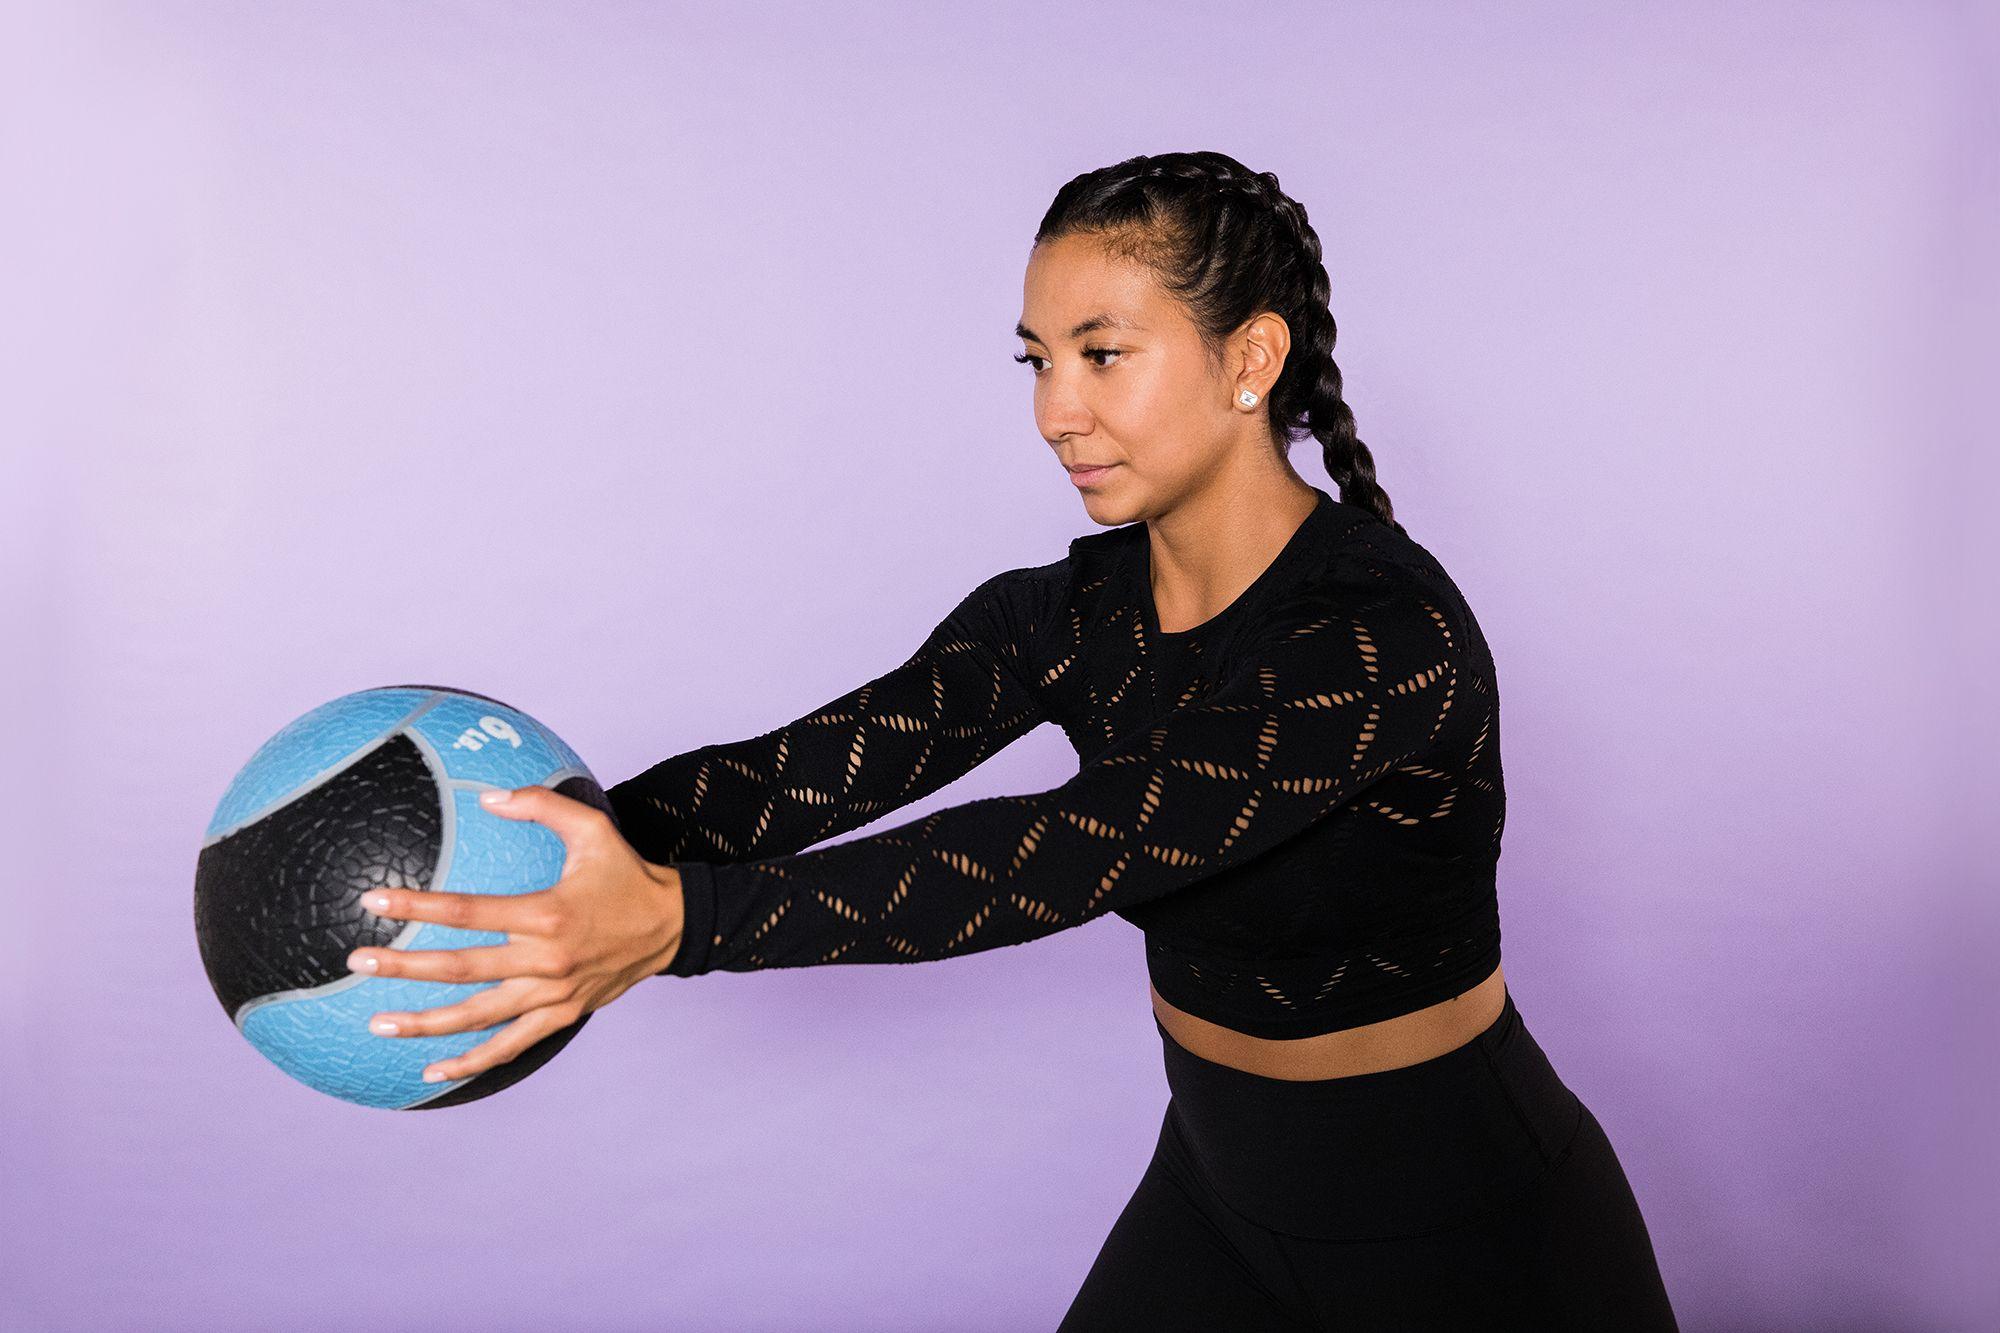 entrainement crossfit avec medecine ball